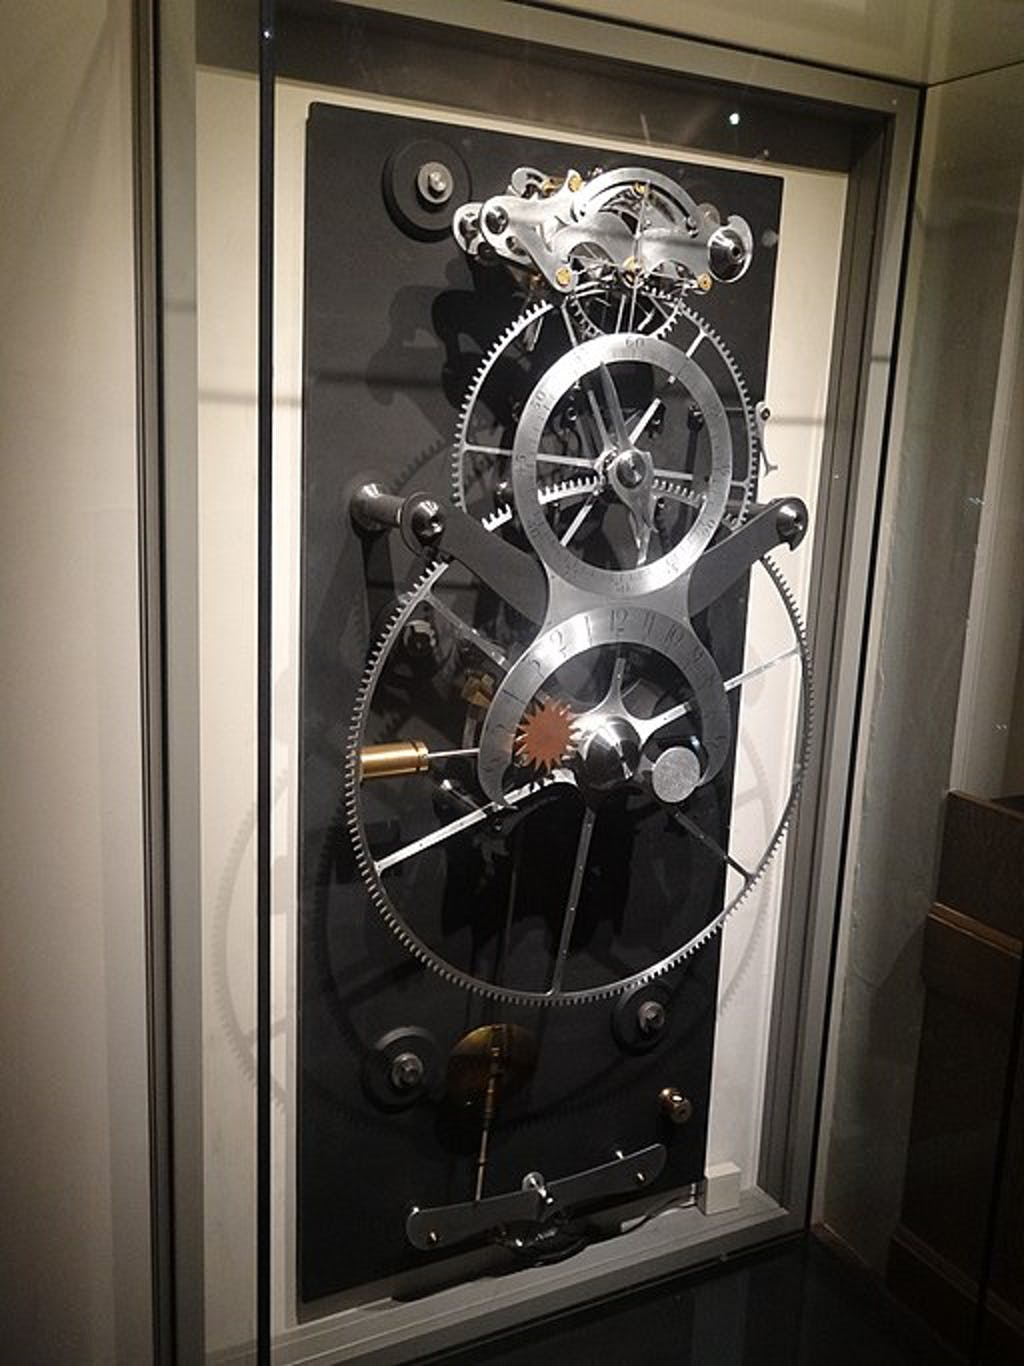 Clock B at the Royal Observatory